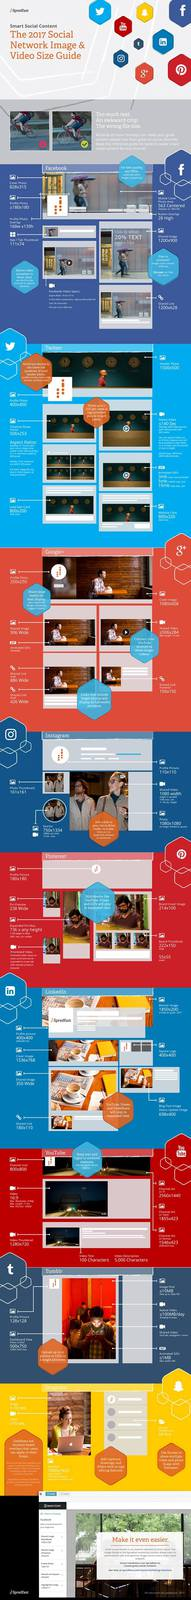 Social Media Image Sizes Cheat Sheet - fairly marvellous